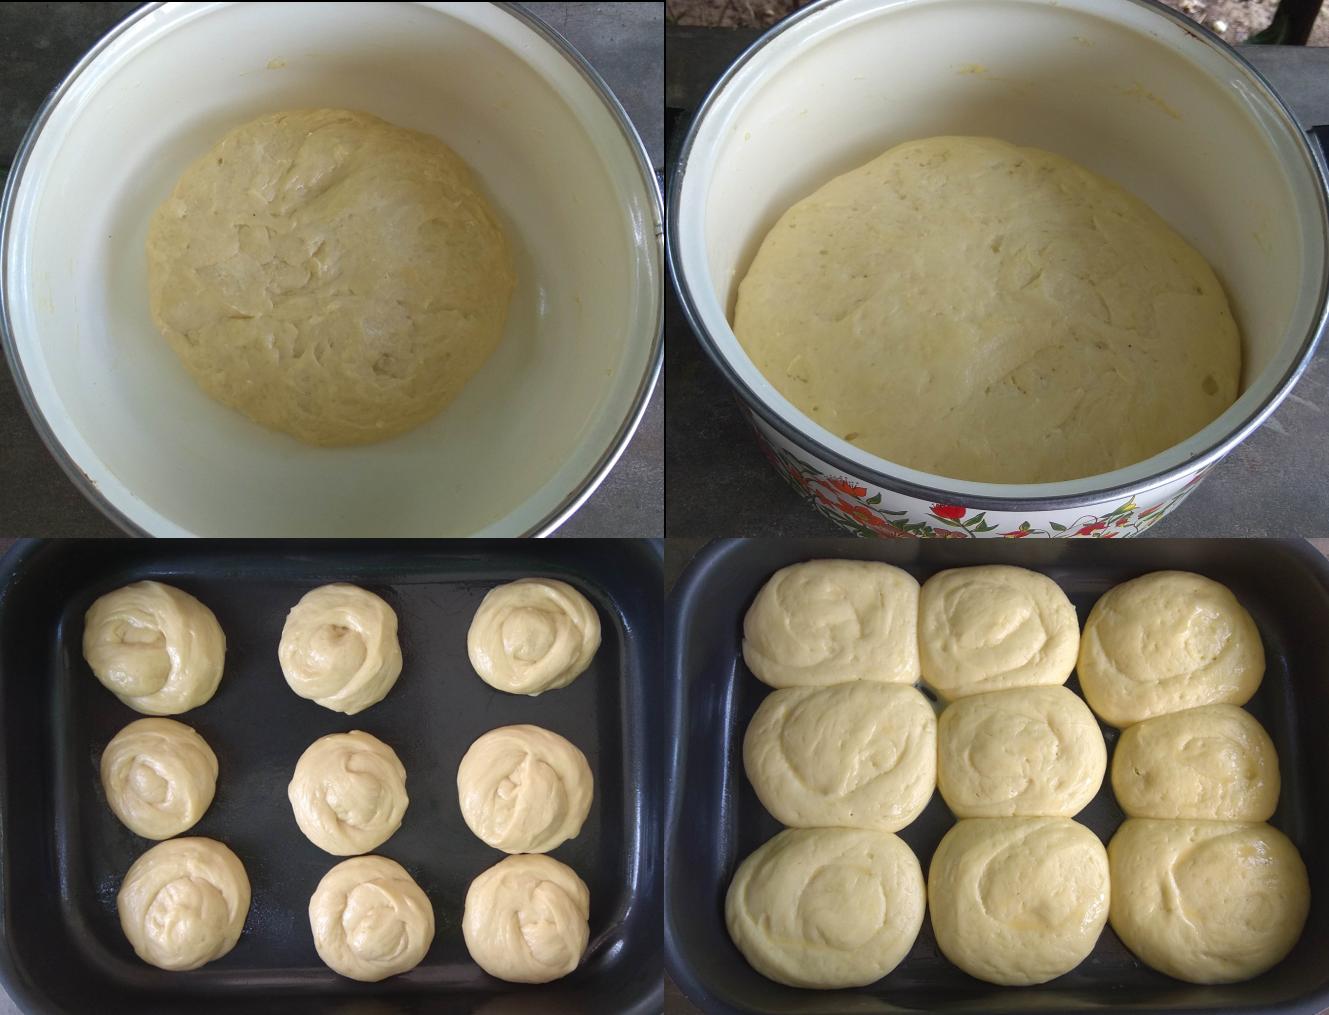 Bread dough, proving bread, yeast